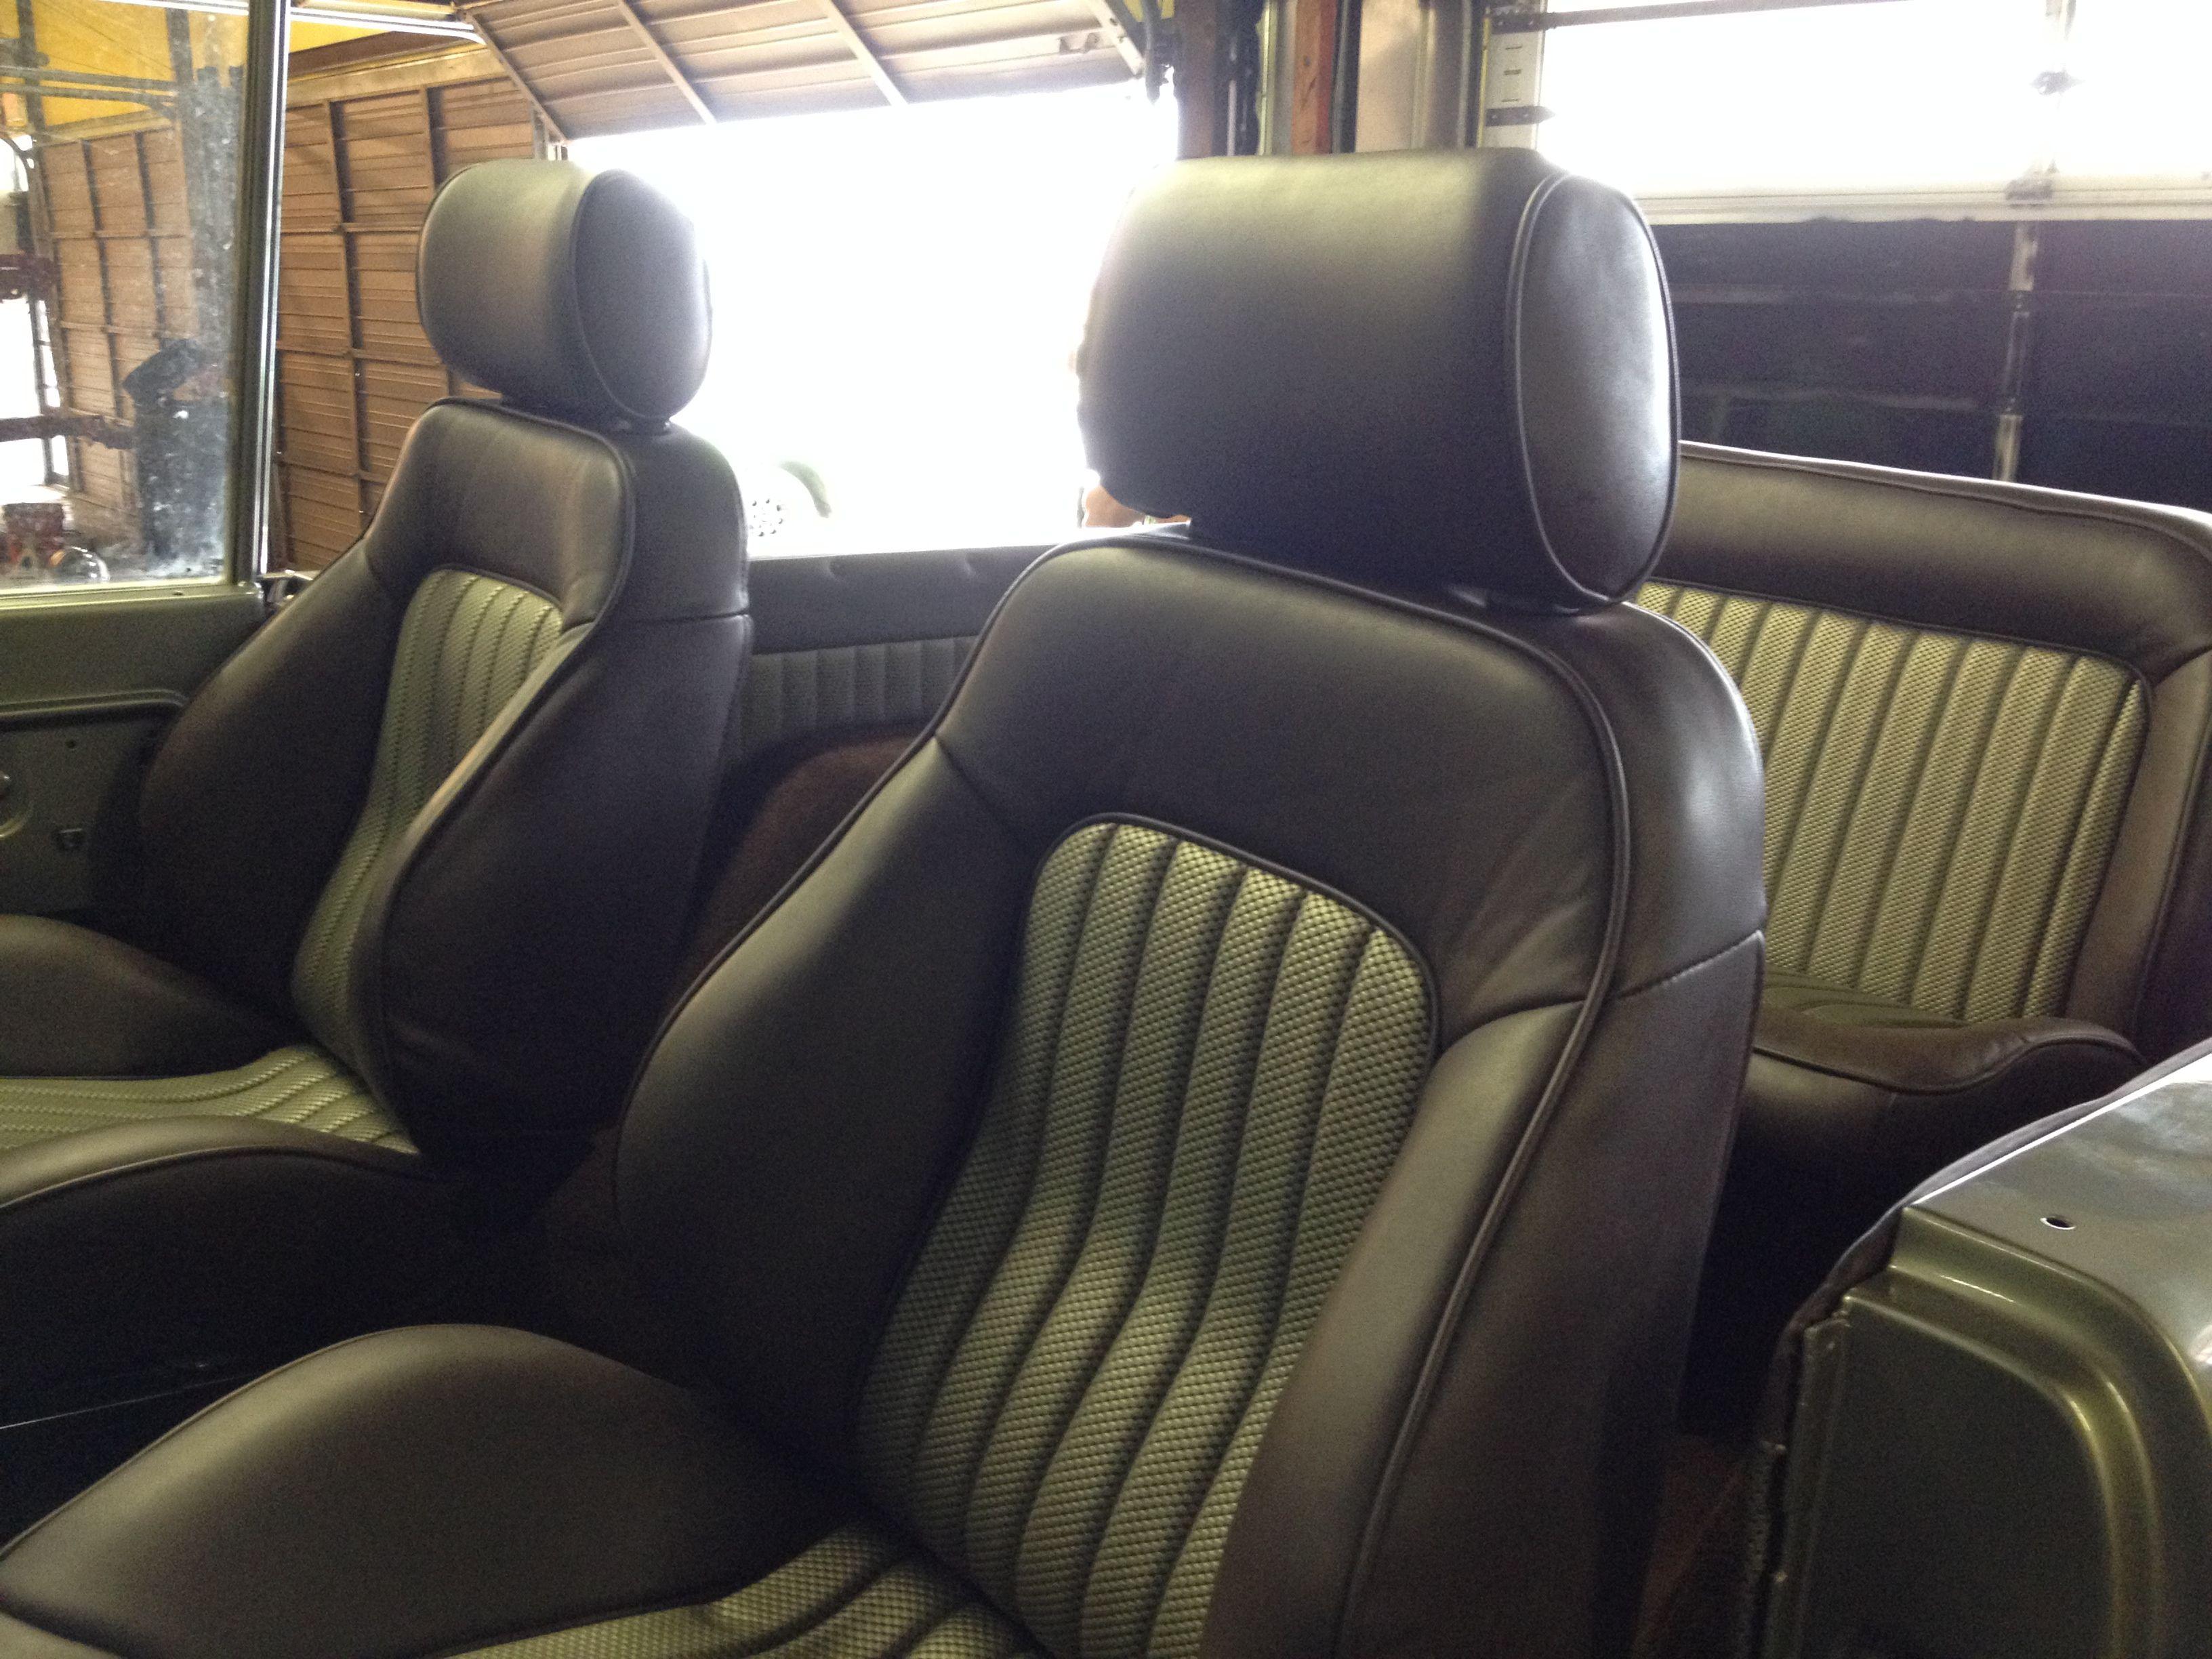 custom seats and interior for the bronco 1971 bronco. Black Bedroom Furniture Sets. Home Design Ideas